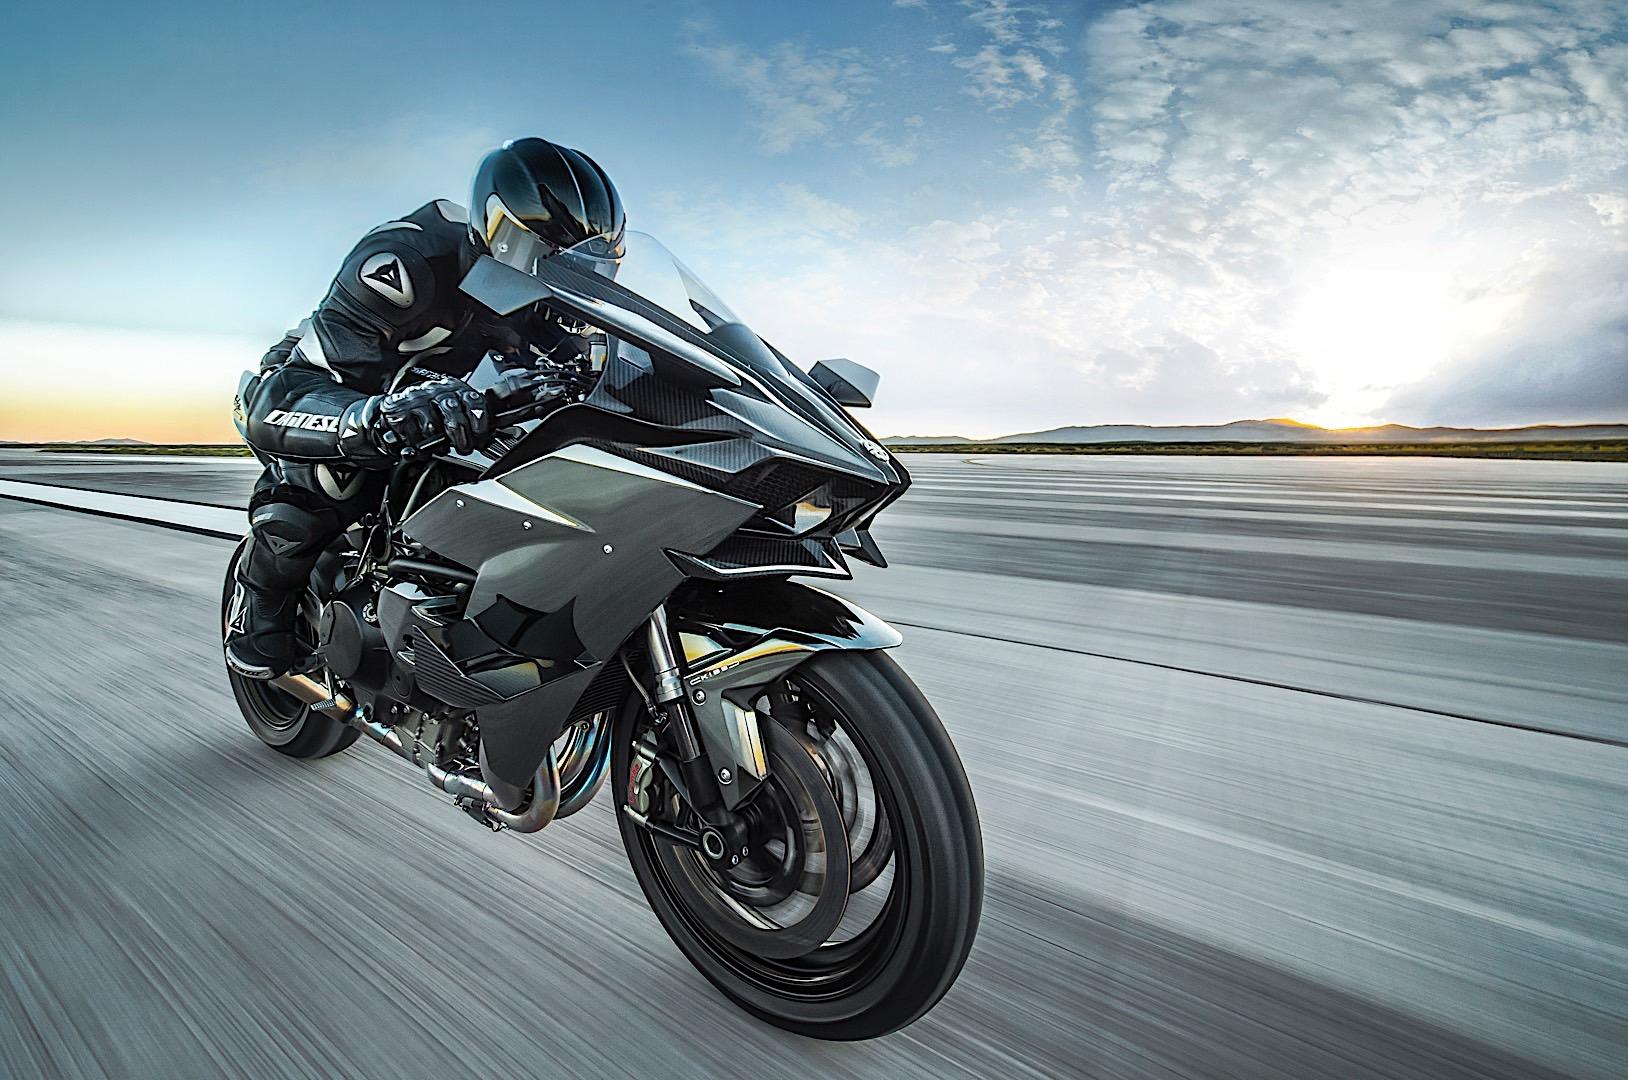 Tom Cruise to ride a Ninja H2R in Top Gun sequel